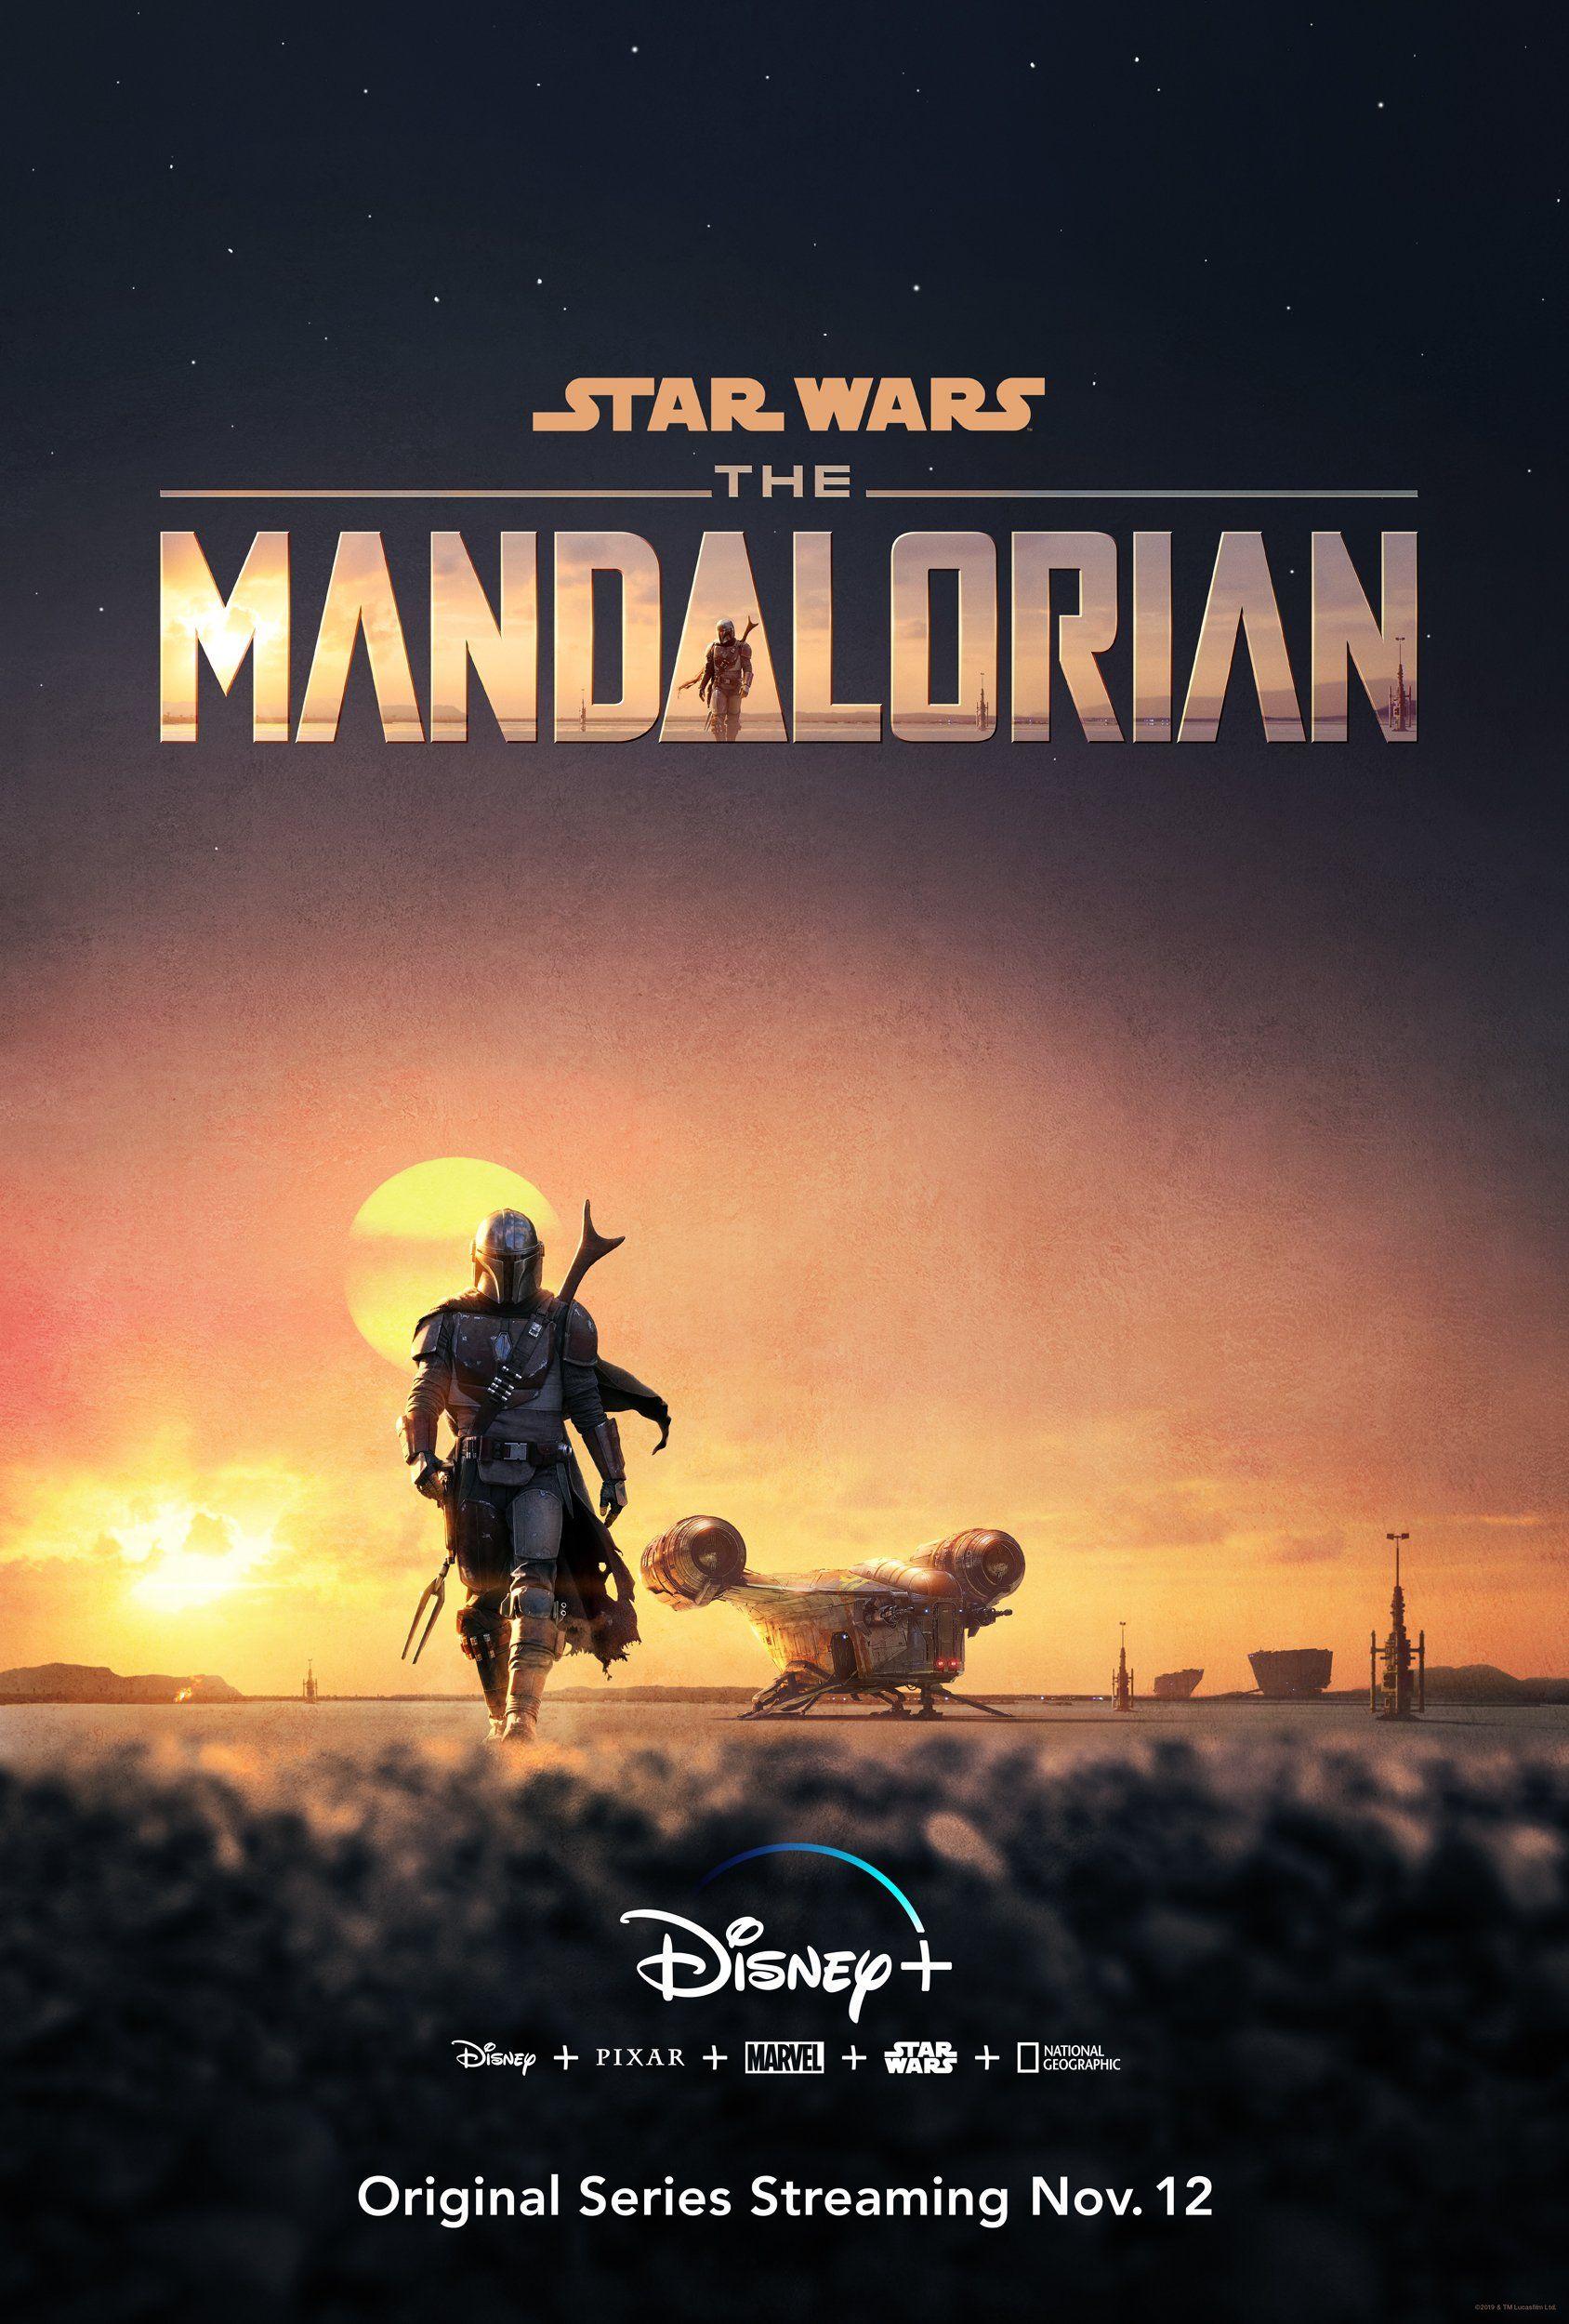 the-mandalorian-poster.jpg